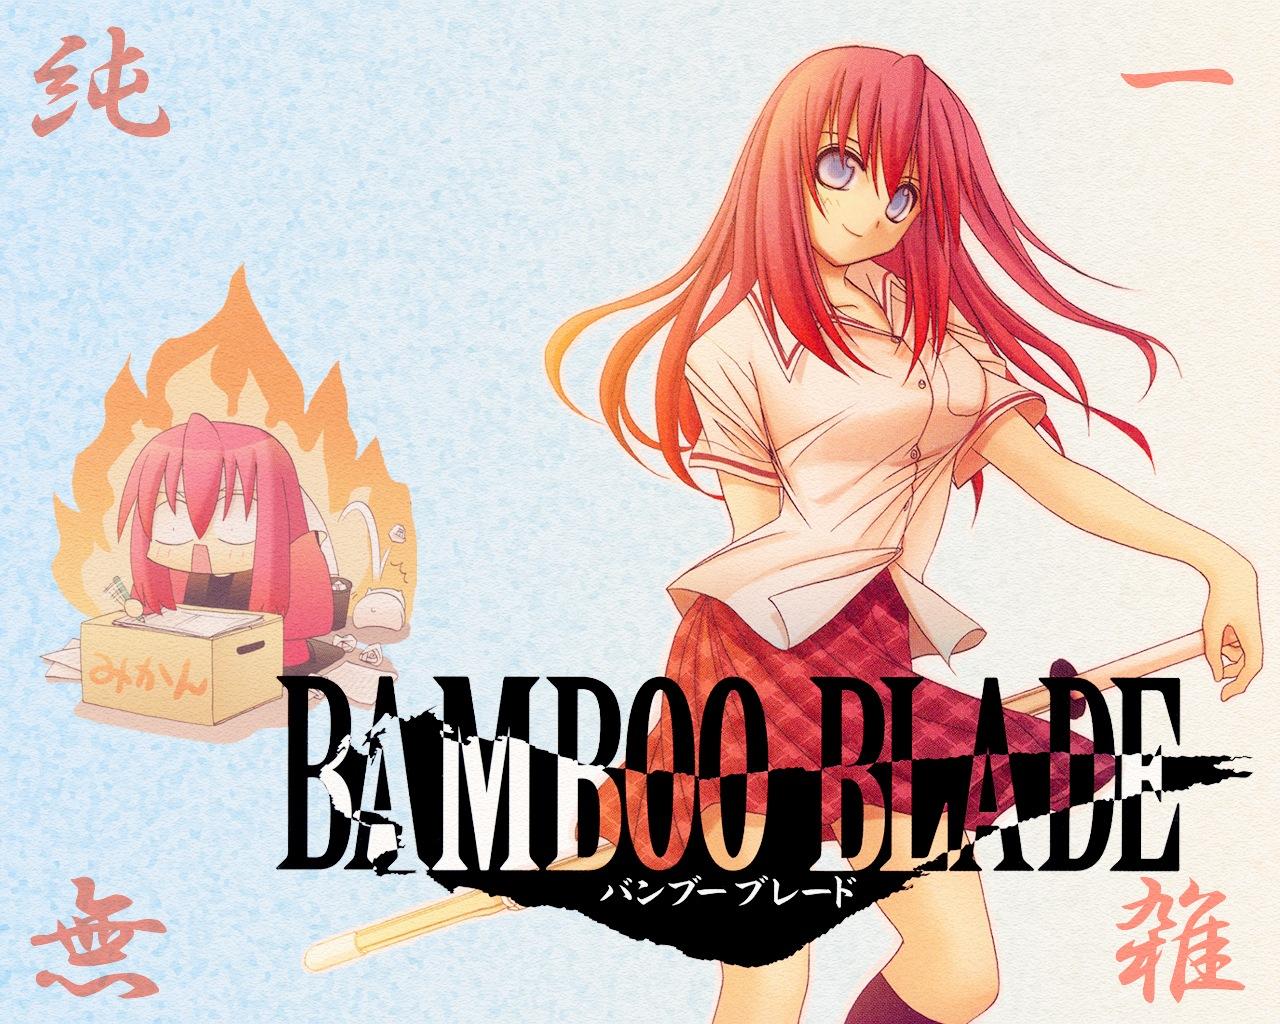 http://image.blog.livedoor.jp/animekurabu/imgs/f/0/f004238a.jpg